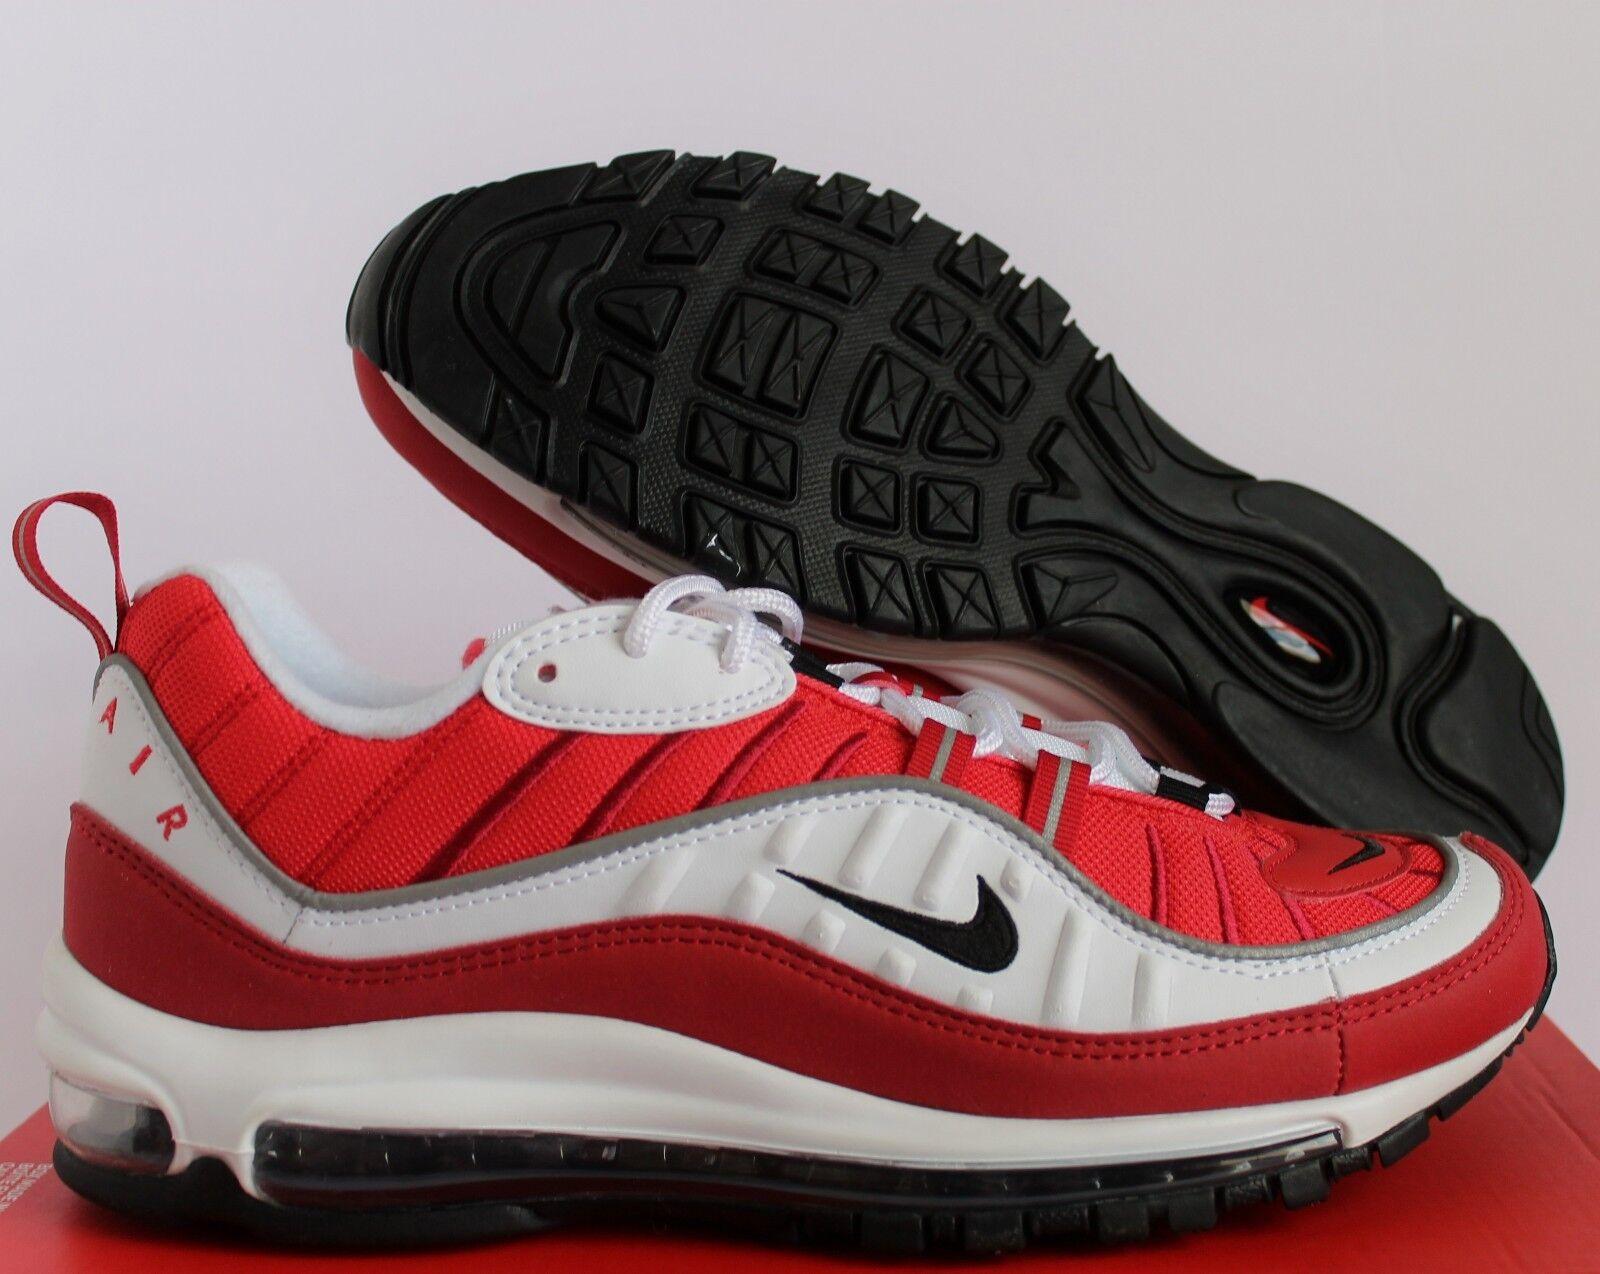 huge discount f5d18 5fd17 Nike Air Max 97 White-Gym Donne White-Gym 97 Red-Nero Sz 11     Uomo Sz 9,5  Ah6799-101